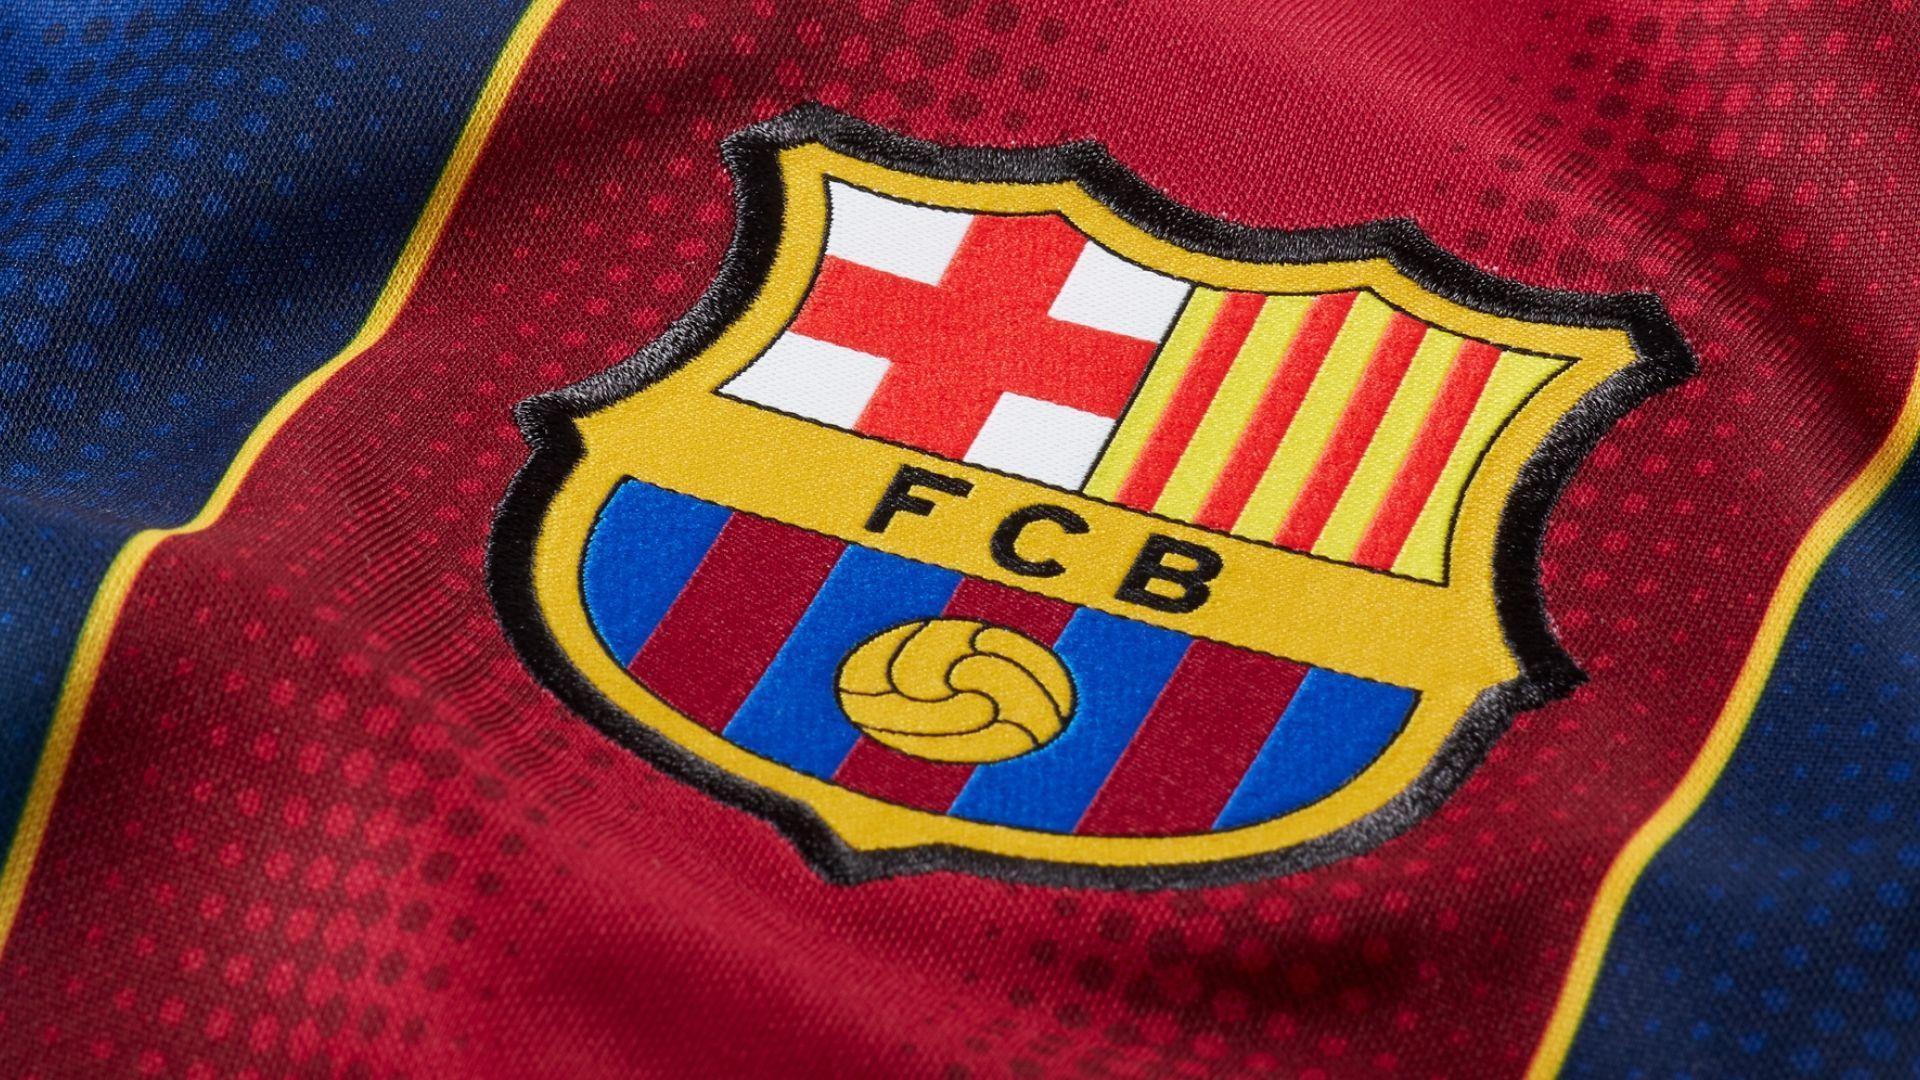 Barcelona 2021 Wallpapers - Top Free Barcelona 2021 ...